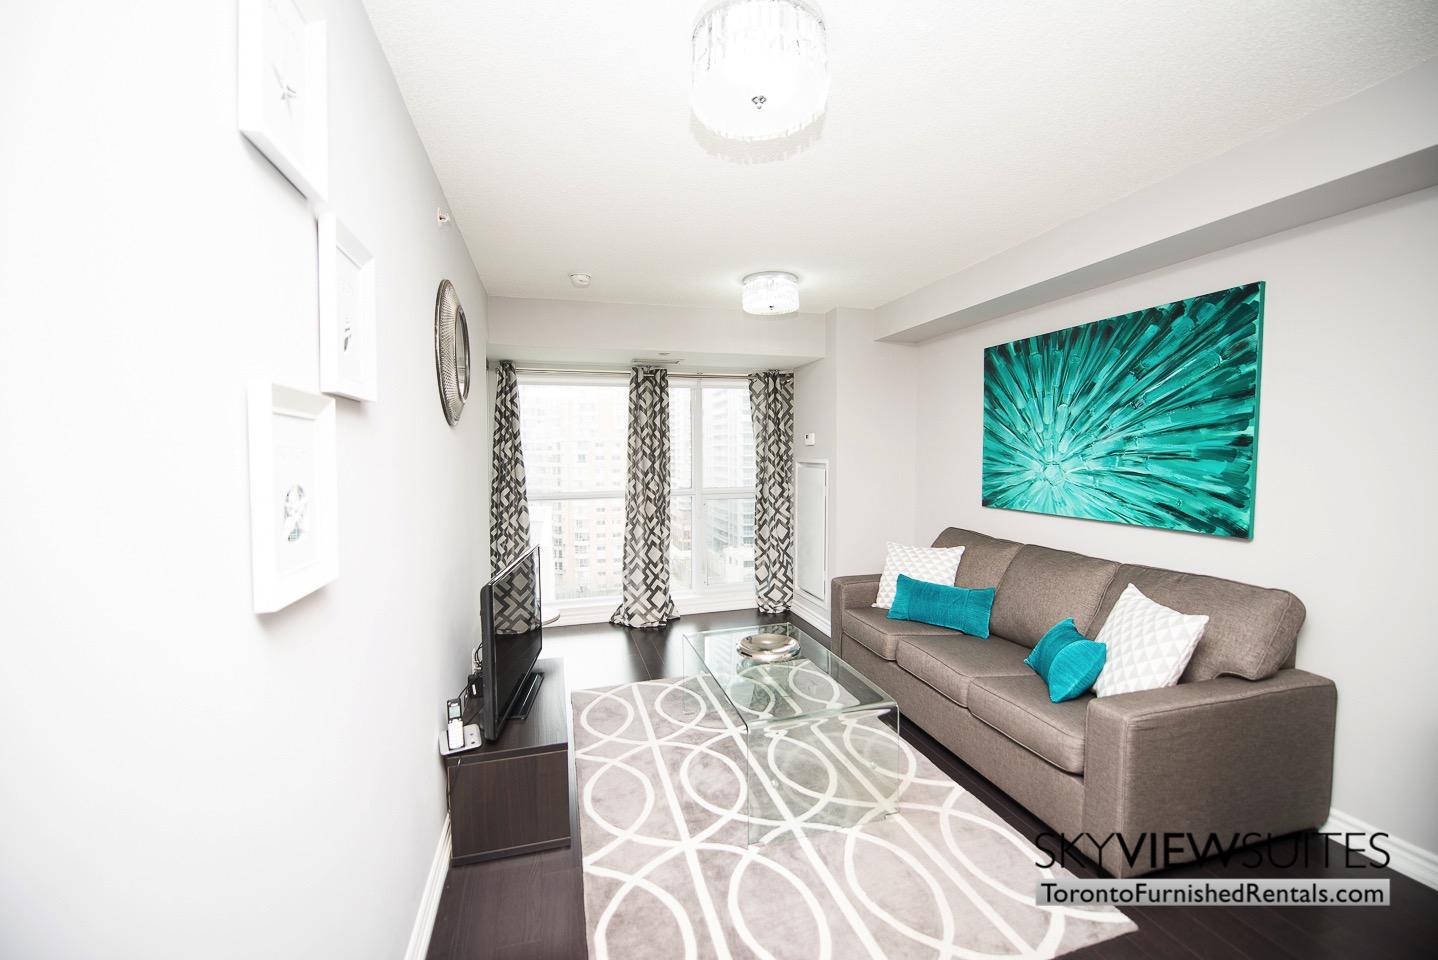 furnished-rentals-toronto-living-room-college